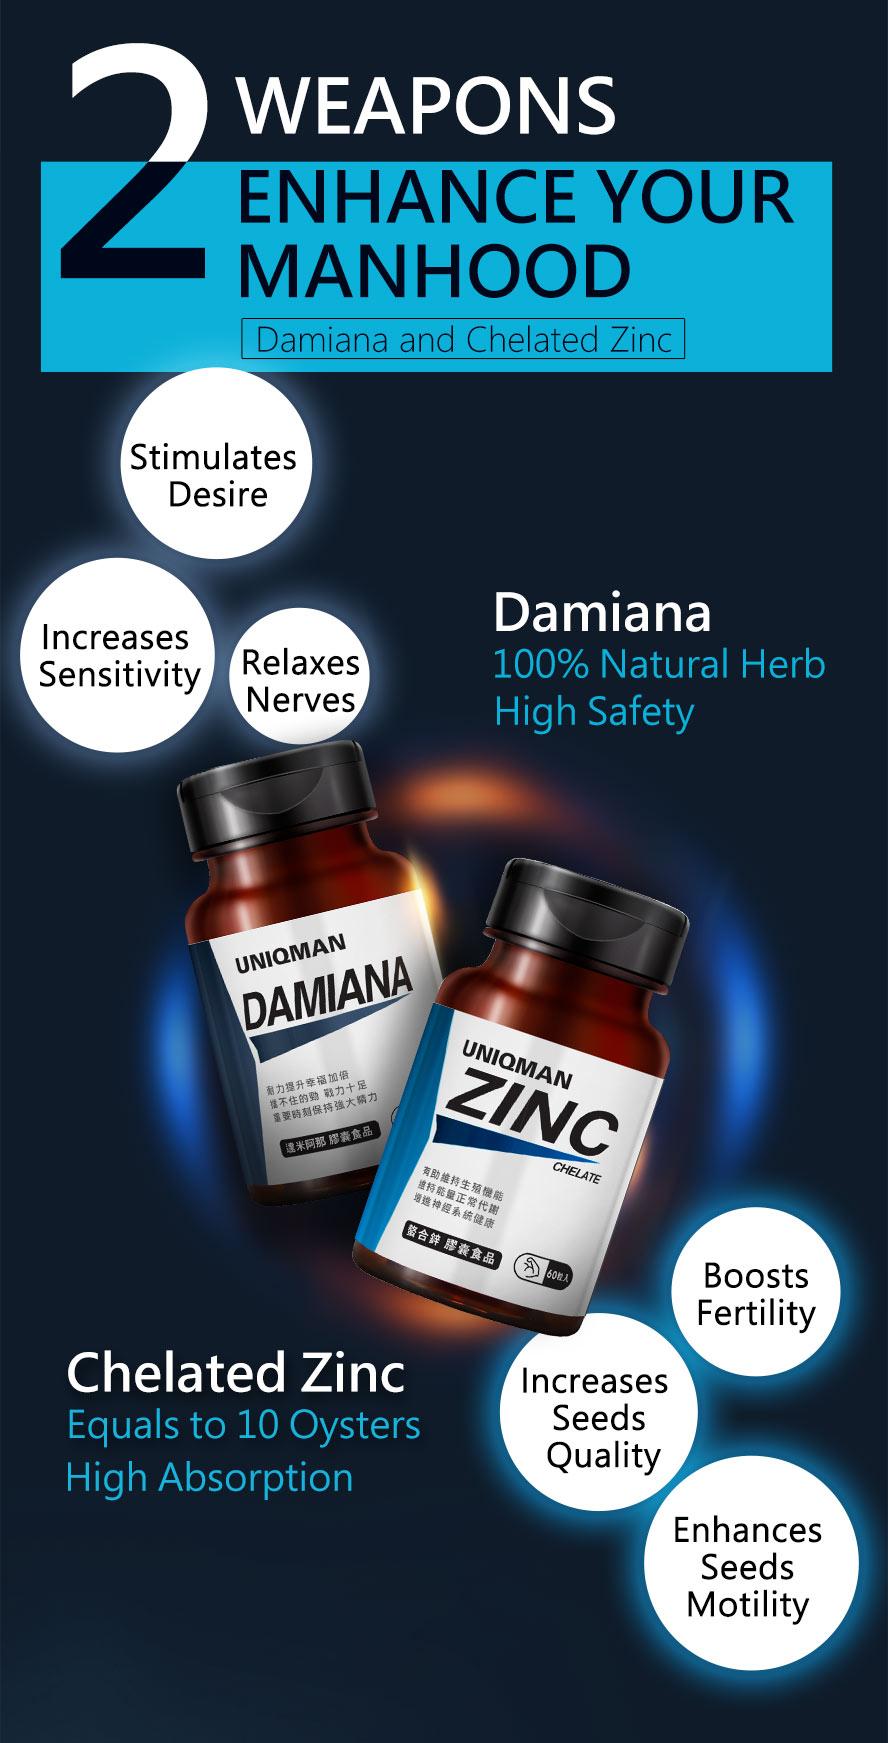 UNIQMAN Damiana is 100% natural herbal aphrodisiac